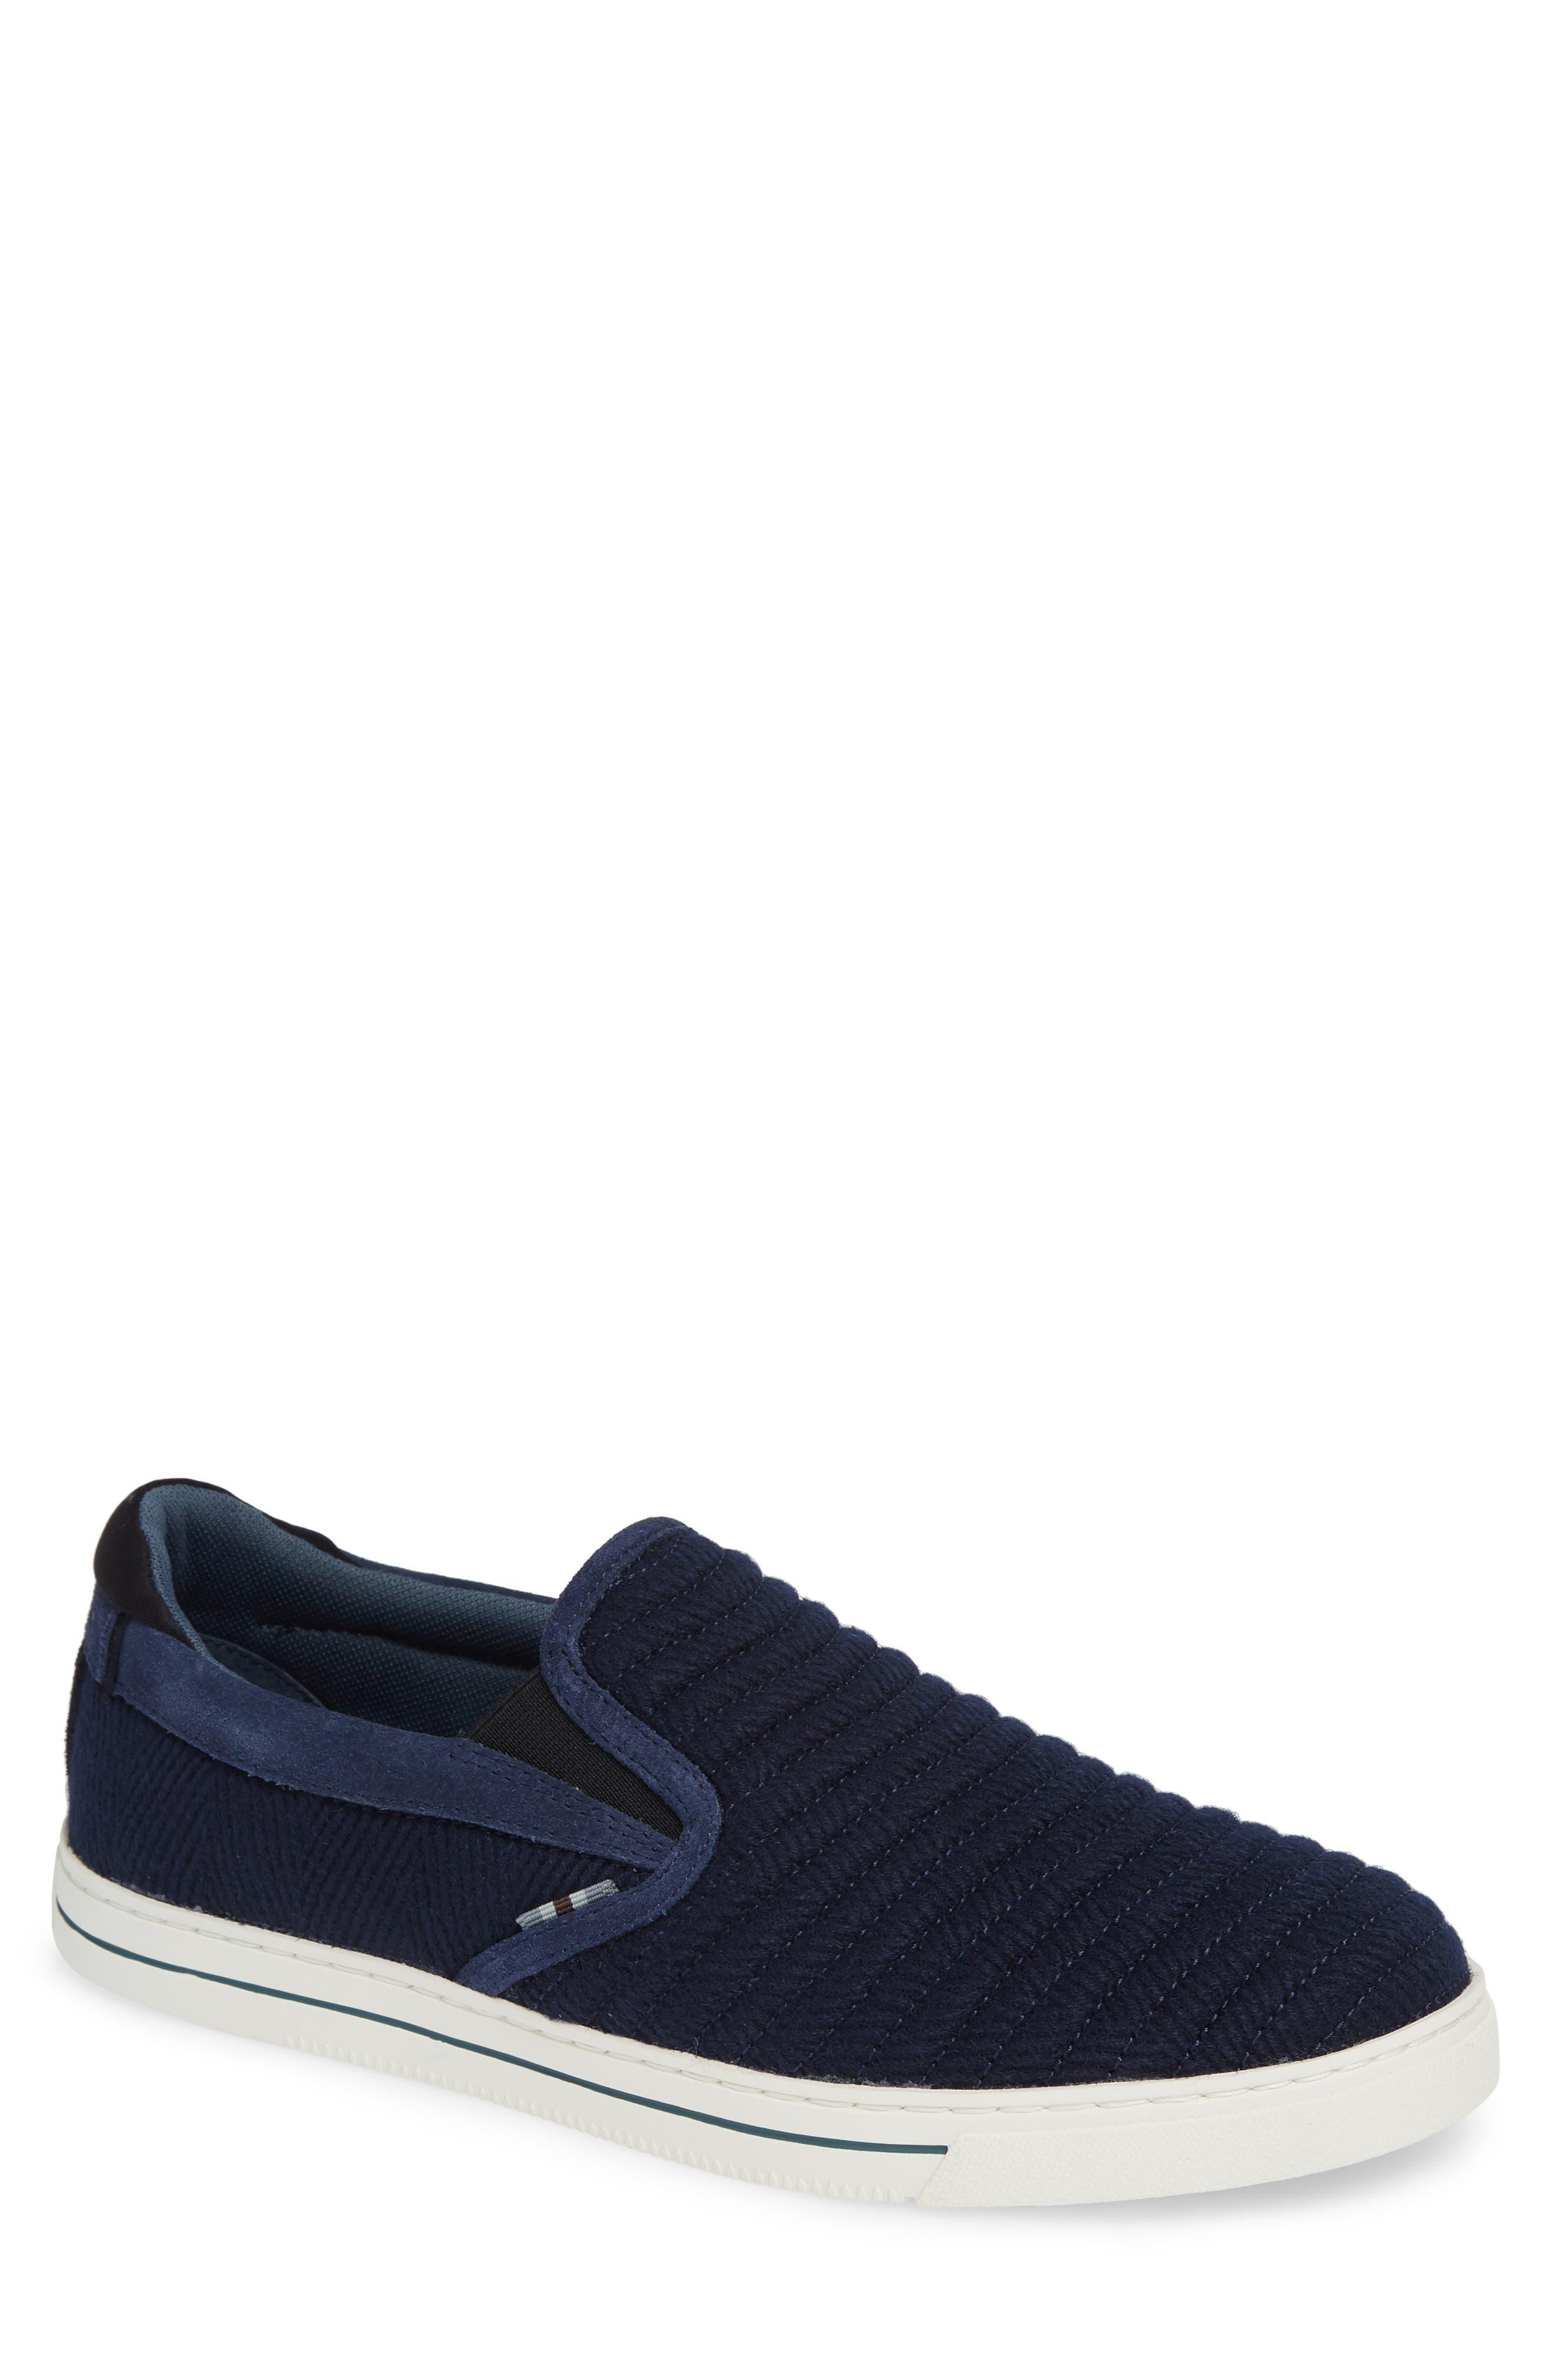 Daniam Slip-On Sneaker,                         Main,                         color, DARK BLUE WOOL